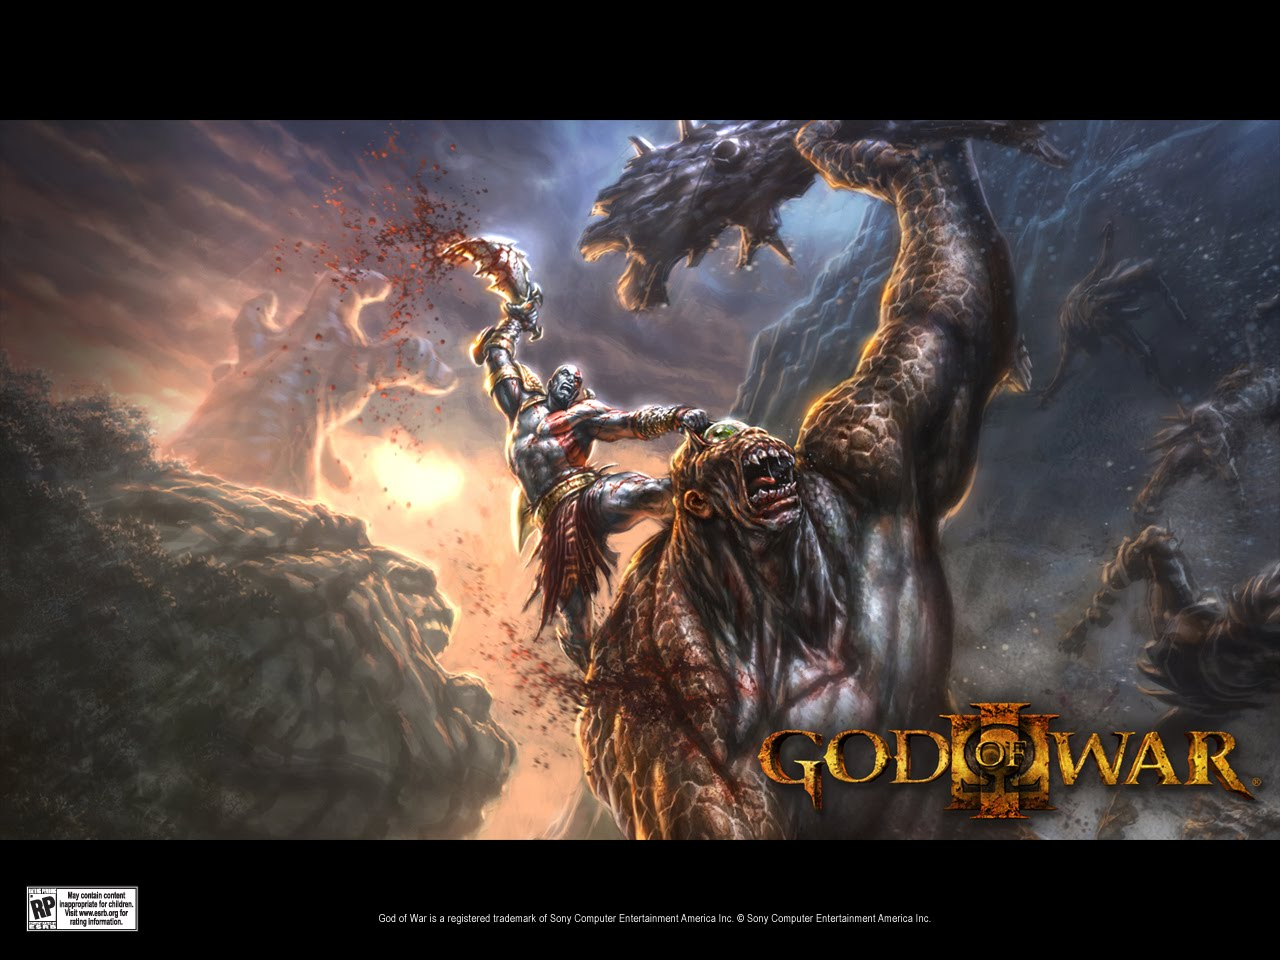 http://4.bp.blogspot.com/-x6Y1dcgFXhY/TZgSOGYERsI/AAAAAAAAIFk/pwQ477fDDPw/s1600/Cnbc_Top_Video_Games_of_2010_God_Of_War_3_Wallpapers_2.jpg